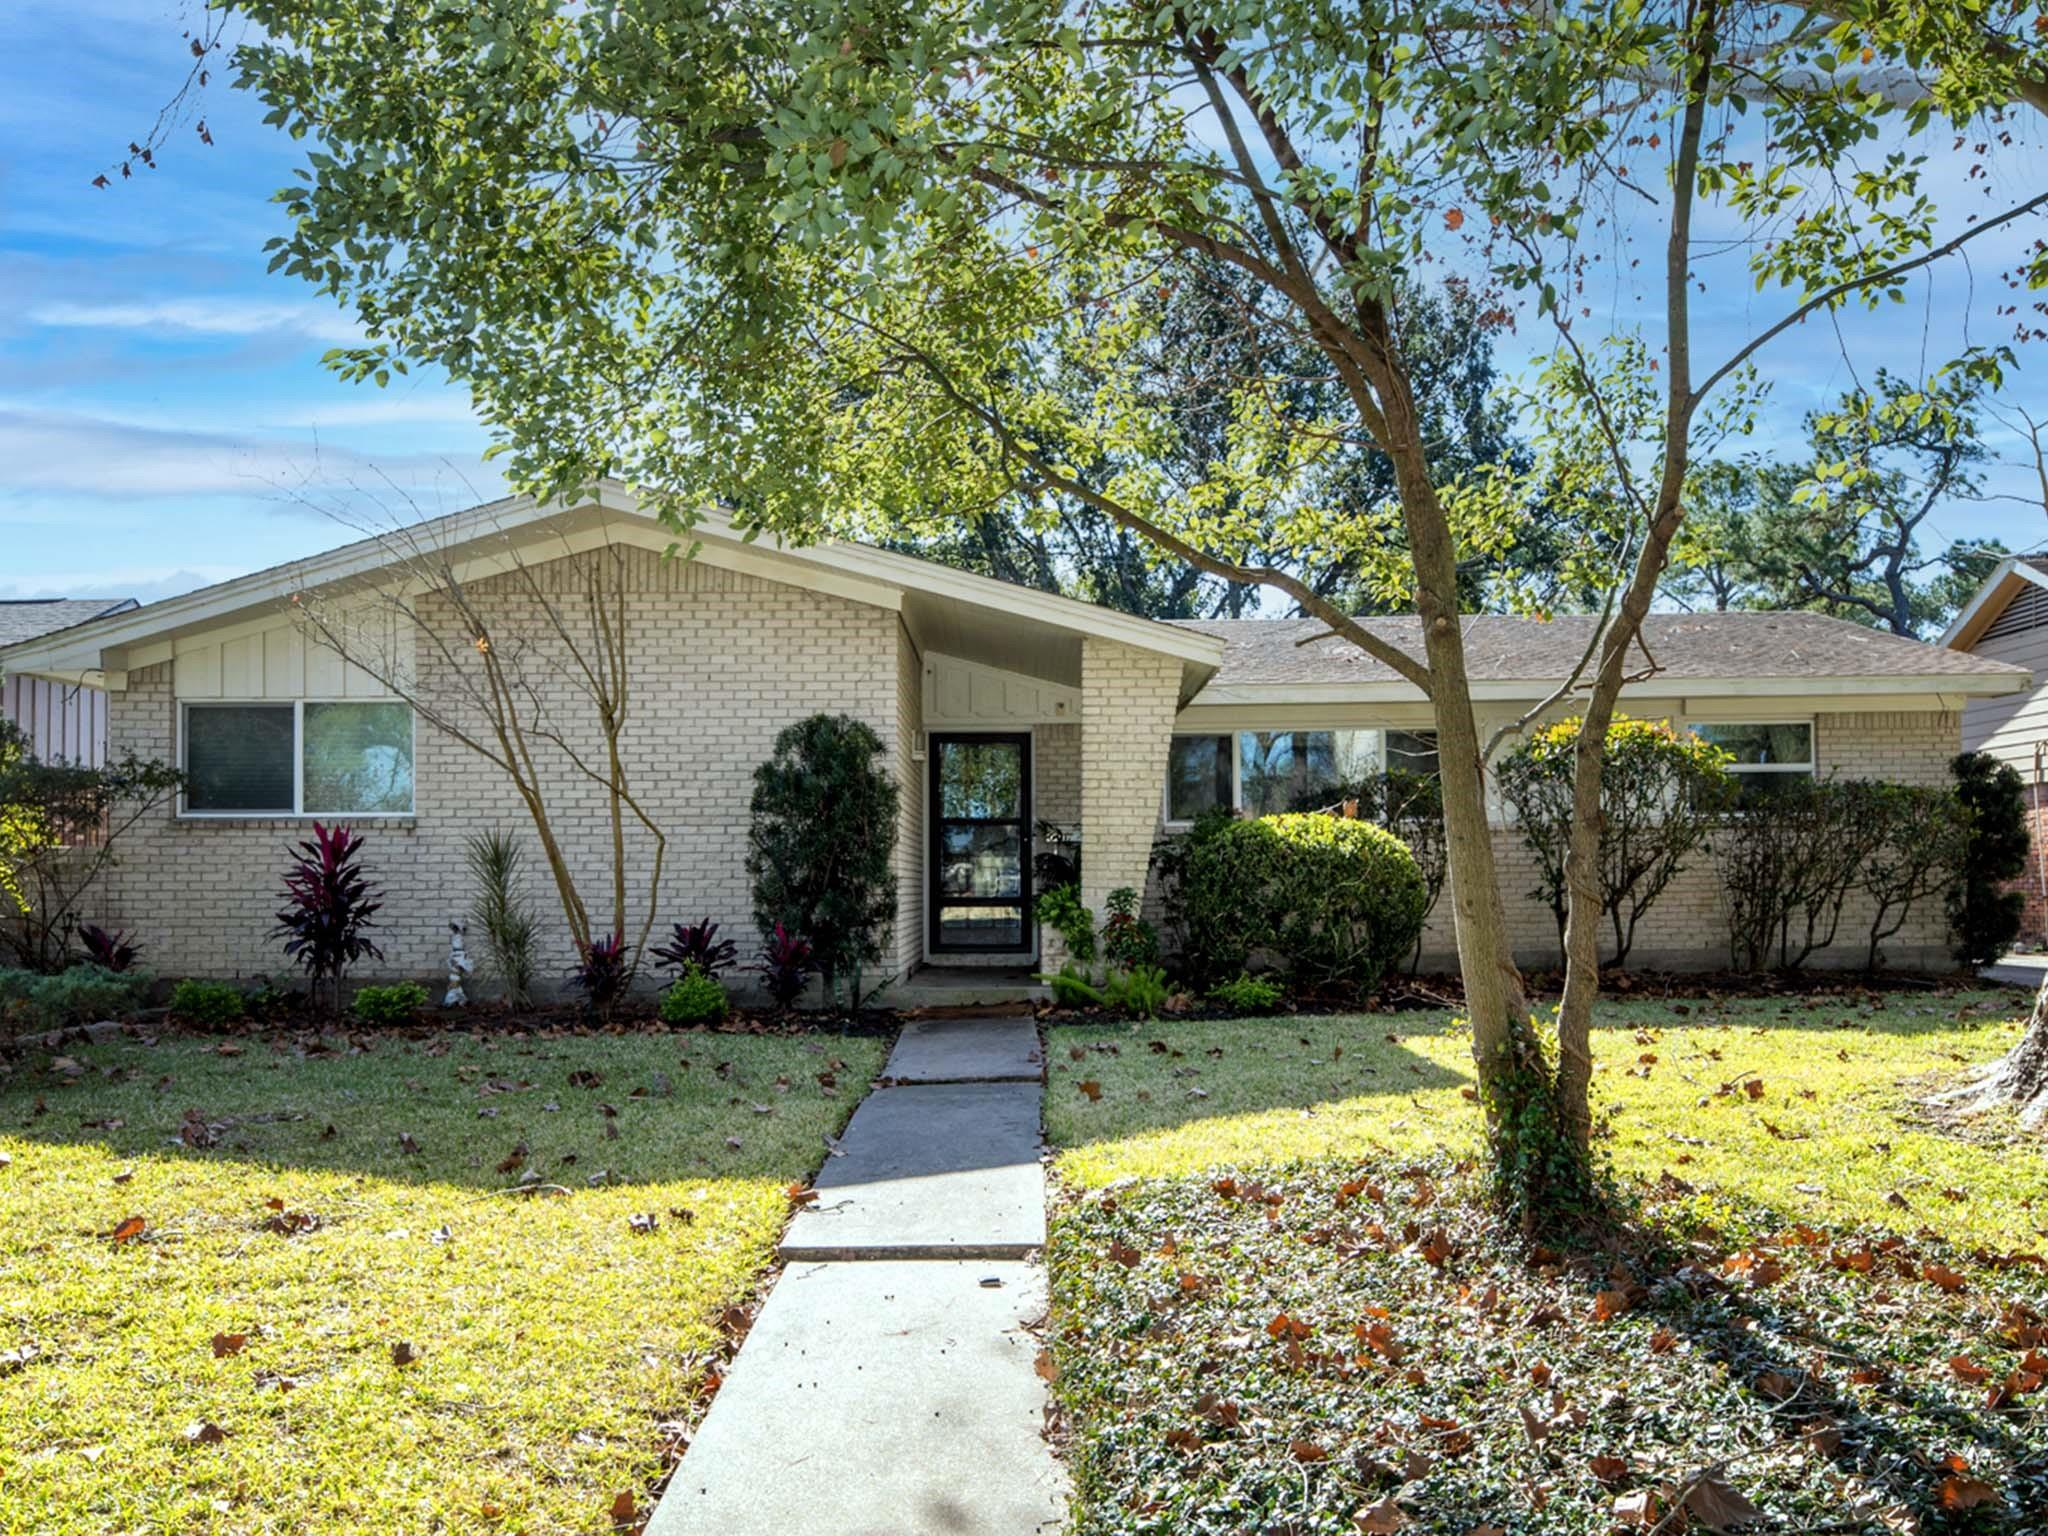 5442 Willow Creek Way Property Photo - Houston, TX real estate listing